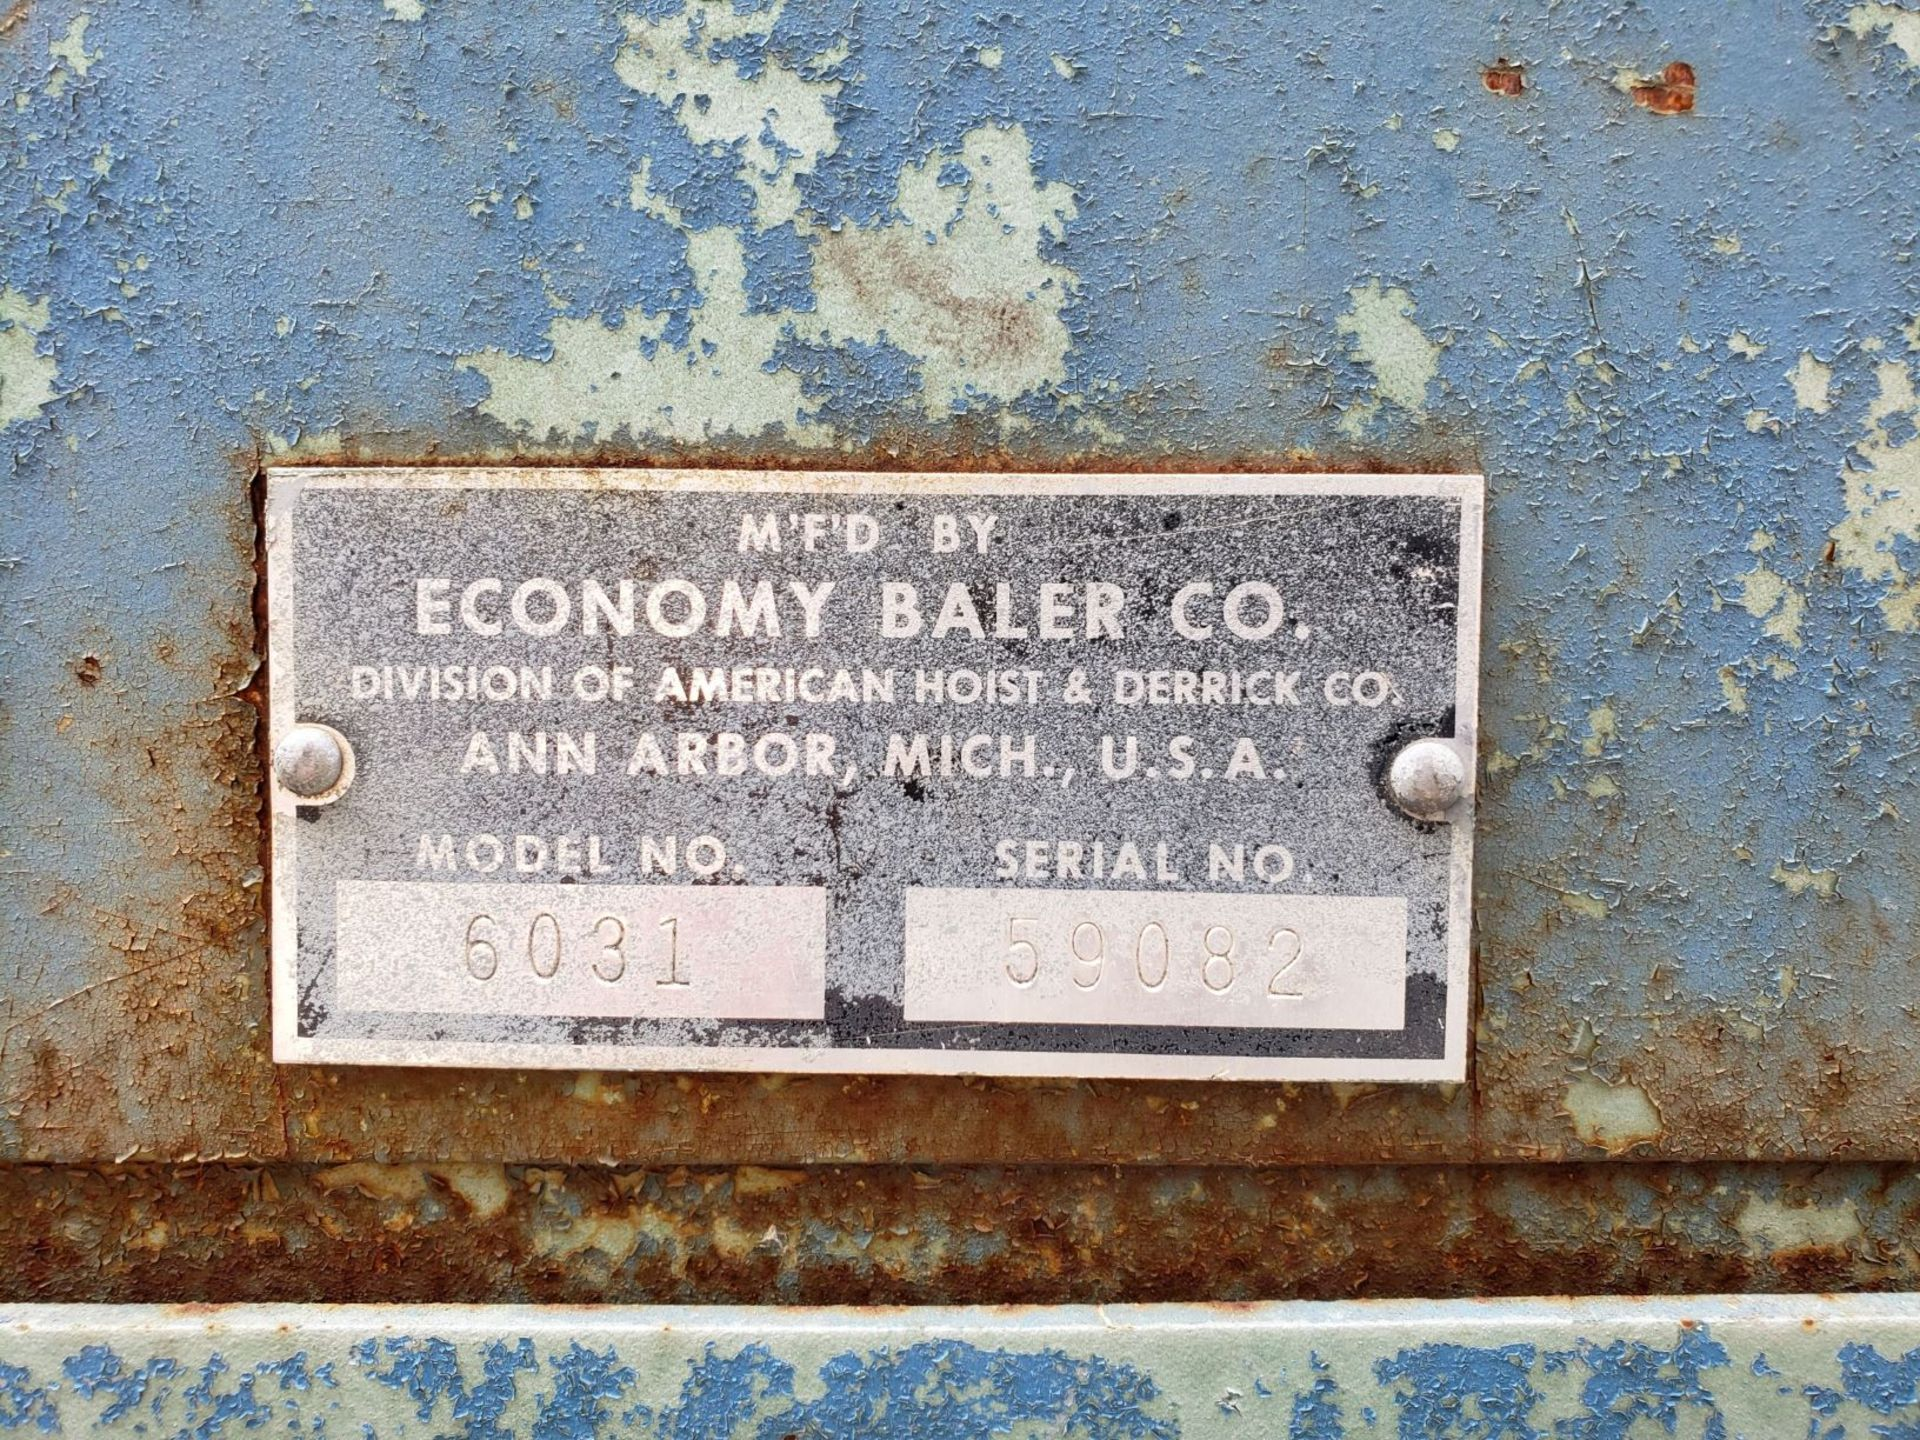 Lot 2 - Economy Baler